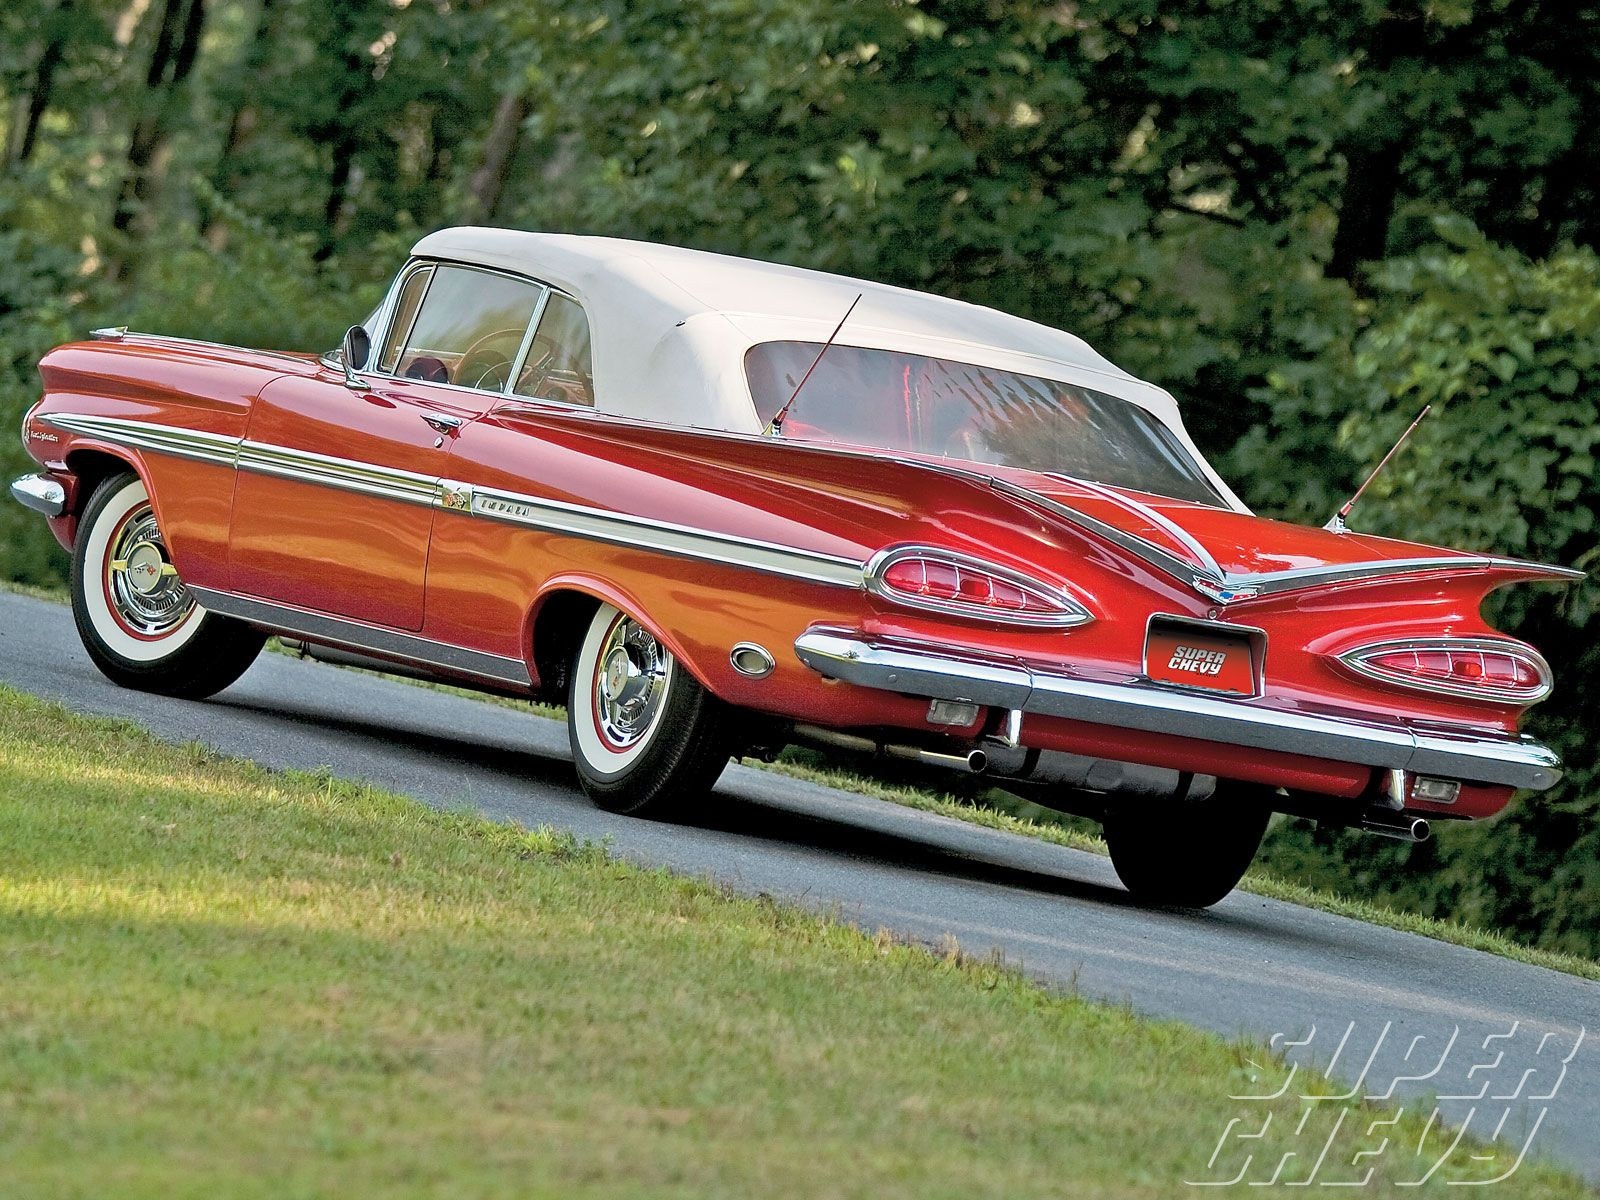 1959 chevrolet impala scott chalk 1959 chevrolet impala convertible driver side rear view  [ 1600 x 1200 Pixel ]